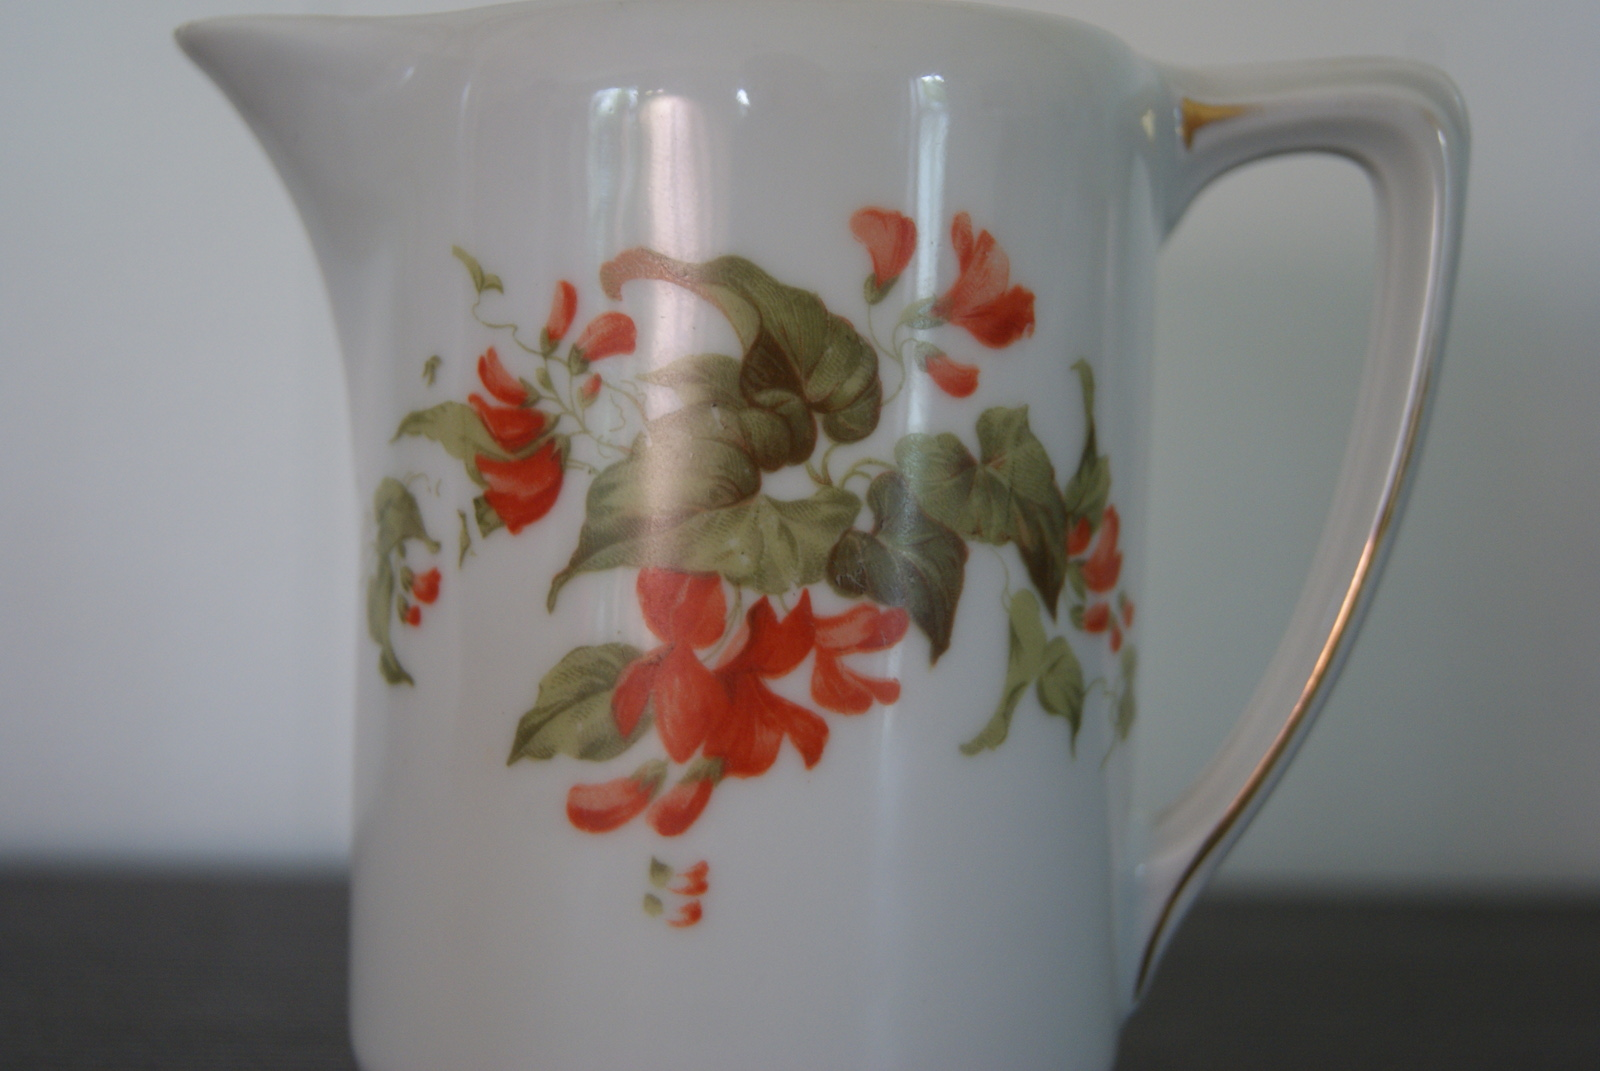 Porsgrund Olaf milk jug with red flowers and leaves